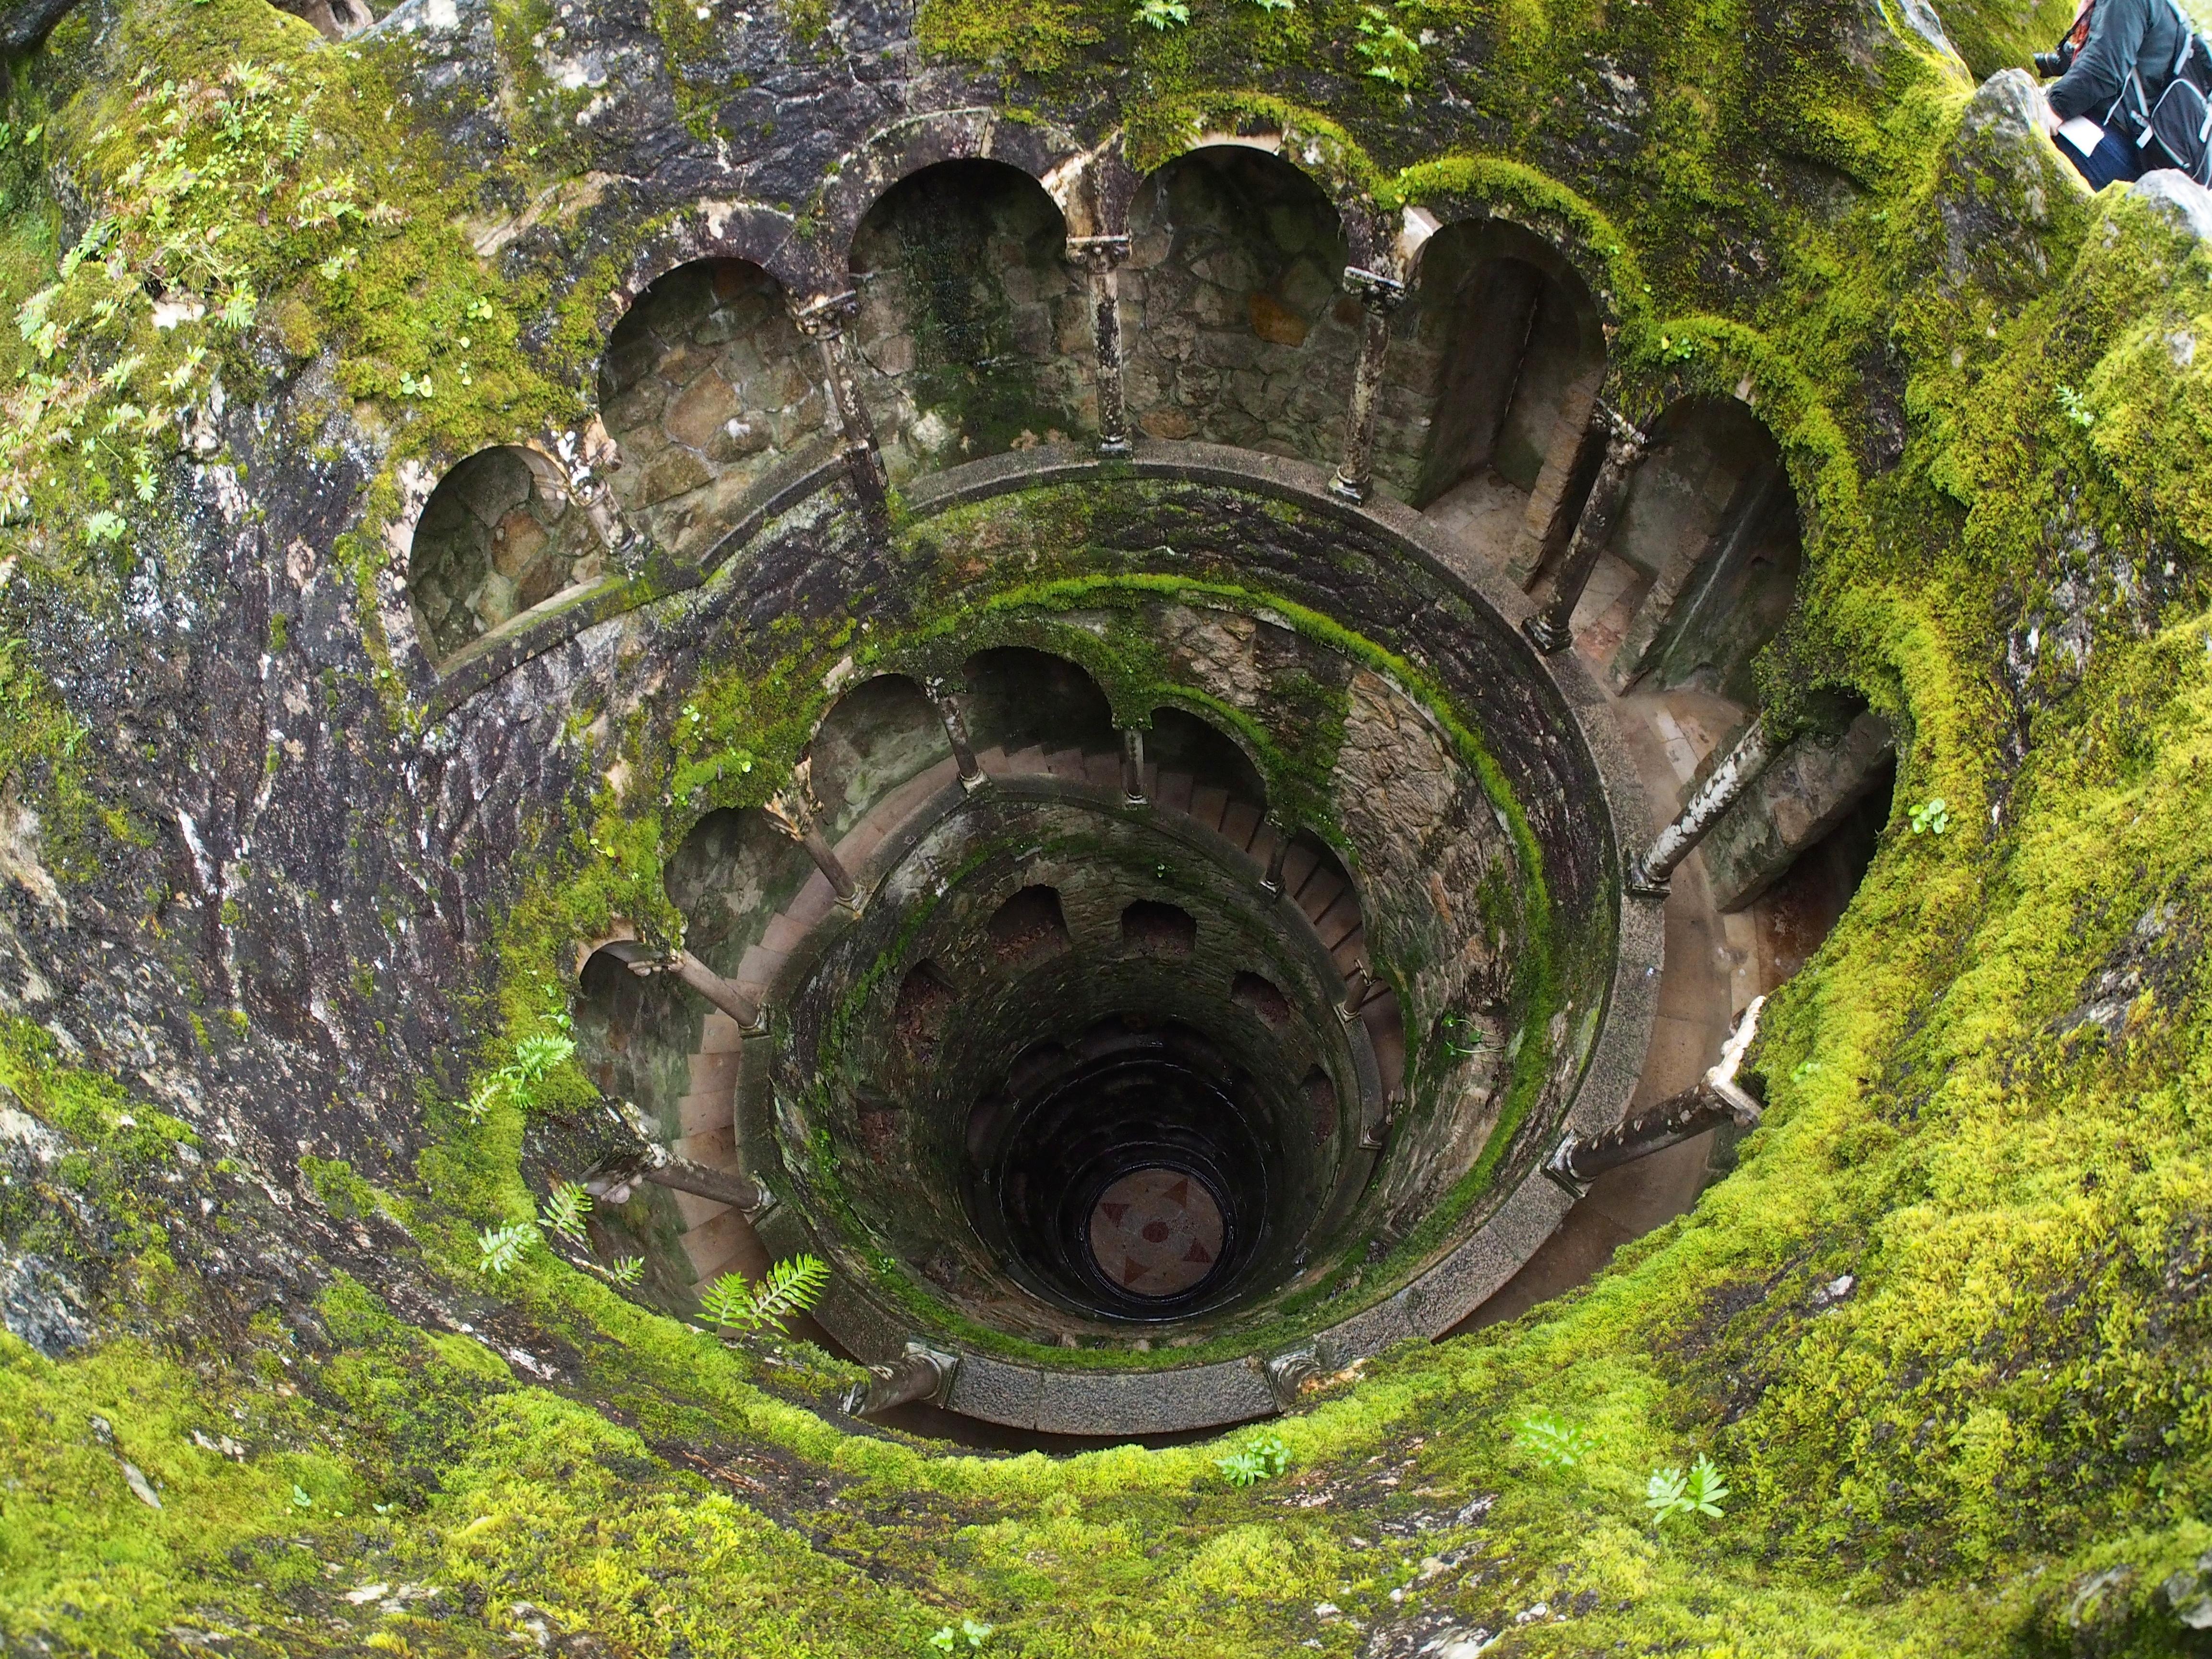 Portugal, Sintra, Quinta da Regaleira Initiation Well1.jpg